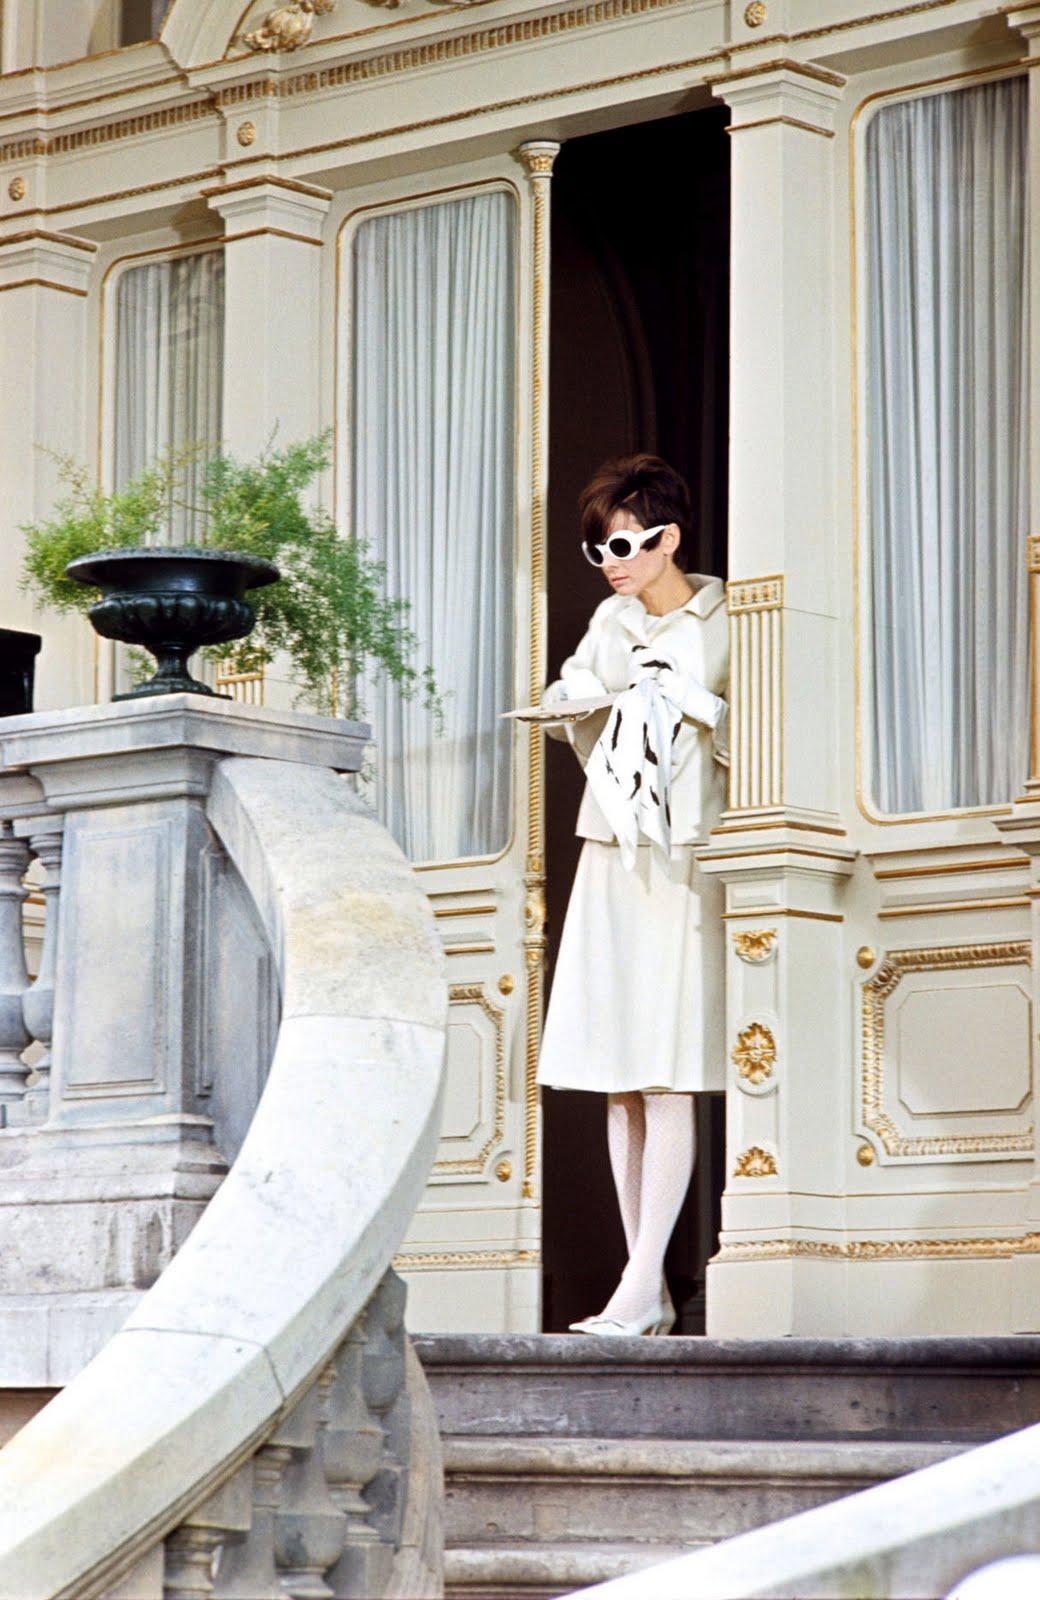 http://3.bp.blogspot.com/_nSEgHGP_SGg/TAHRruA5PXI/AAAAAAAACXQ/xdE9eIy0Nl0/s1600/Annex+-+Hepburn,+Audrey+(How+to+Steal+a+Million)_12.jpg